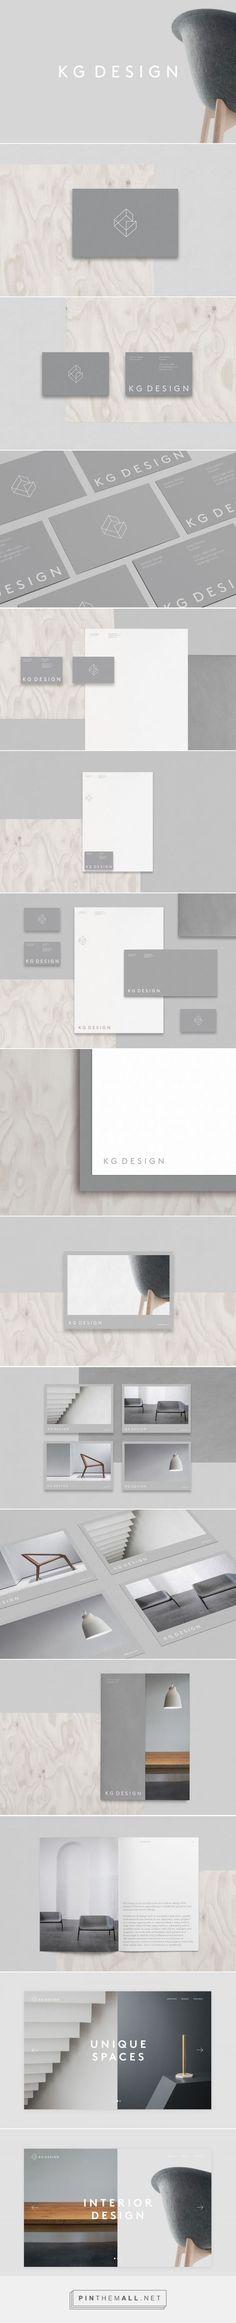 KG Design Interior Design and Arquitecture Firm Branding by Sonia Castillo | Fivestar Branding Agency – Design and Branding Agency & Curated Inspiration Gallery